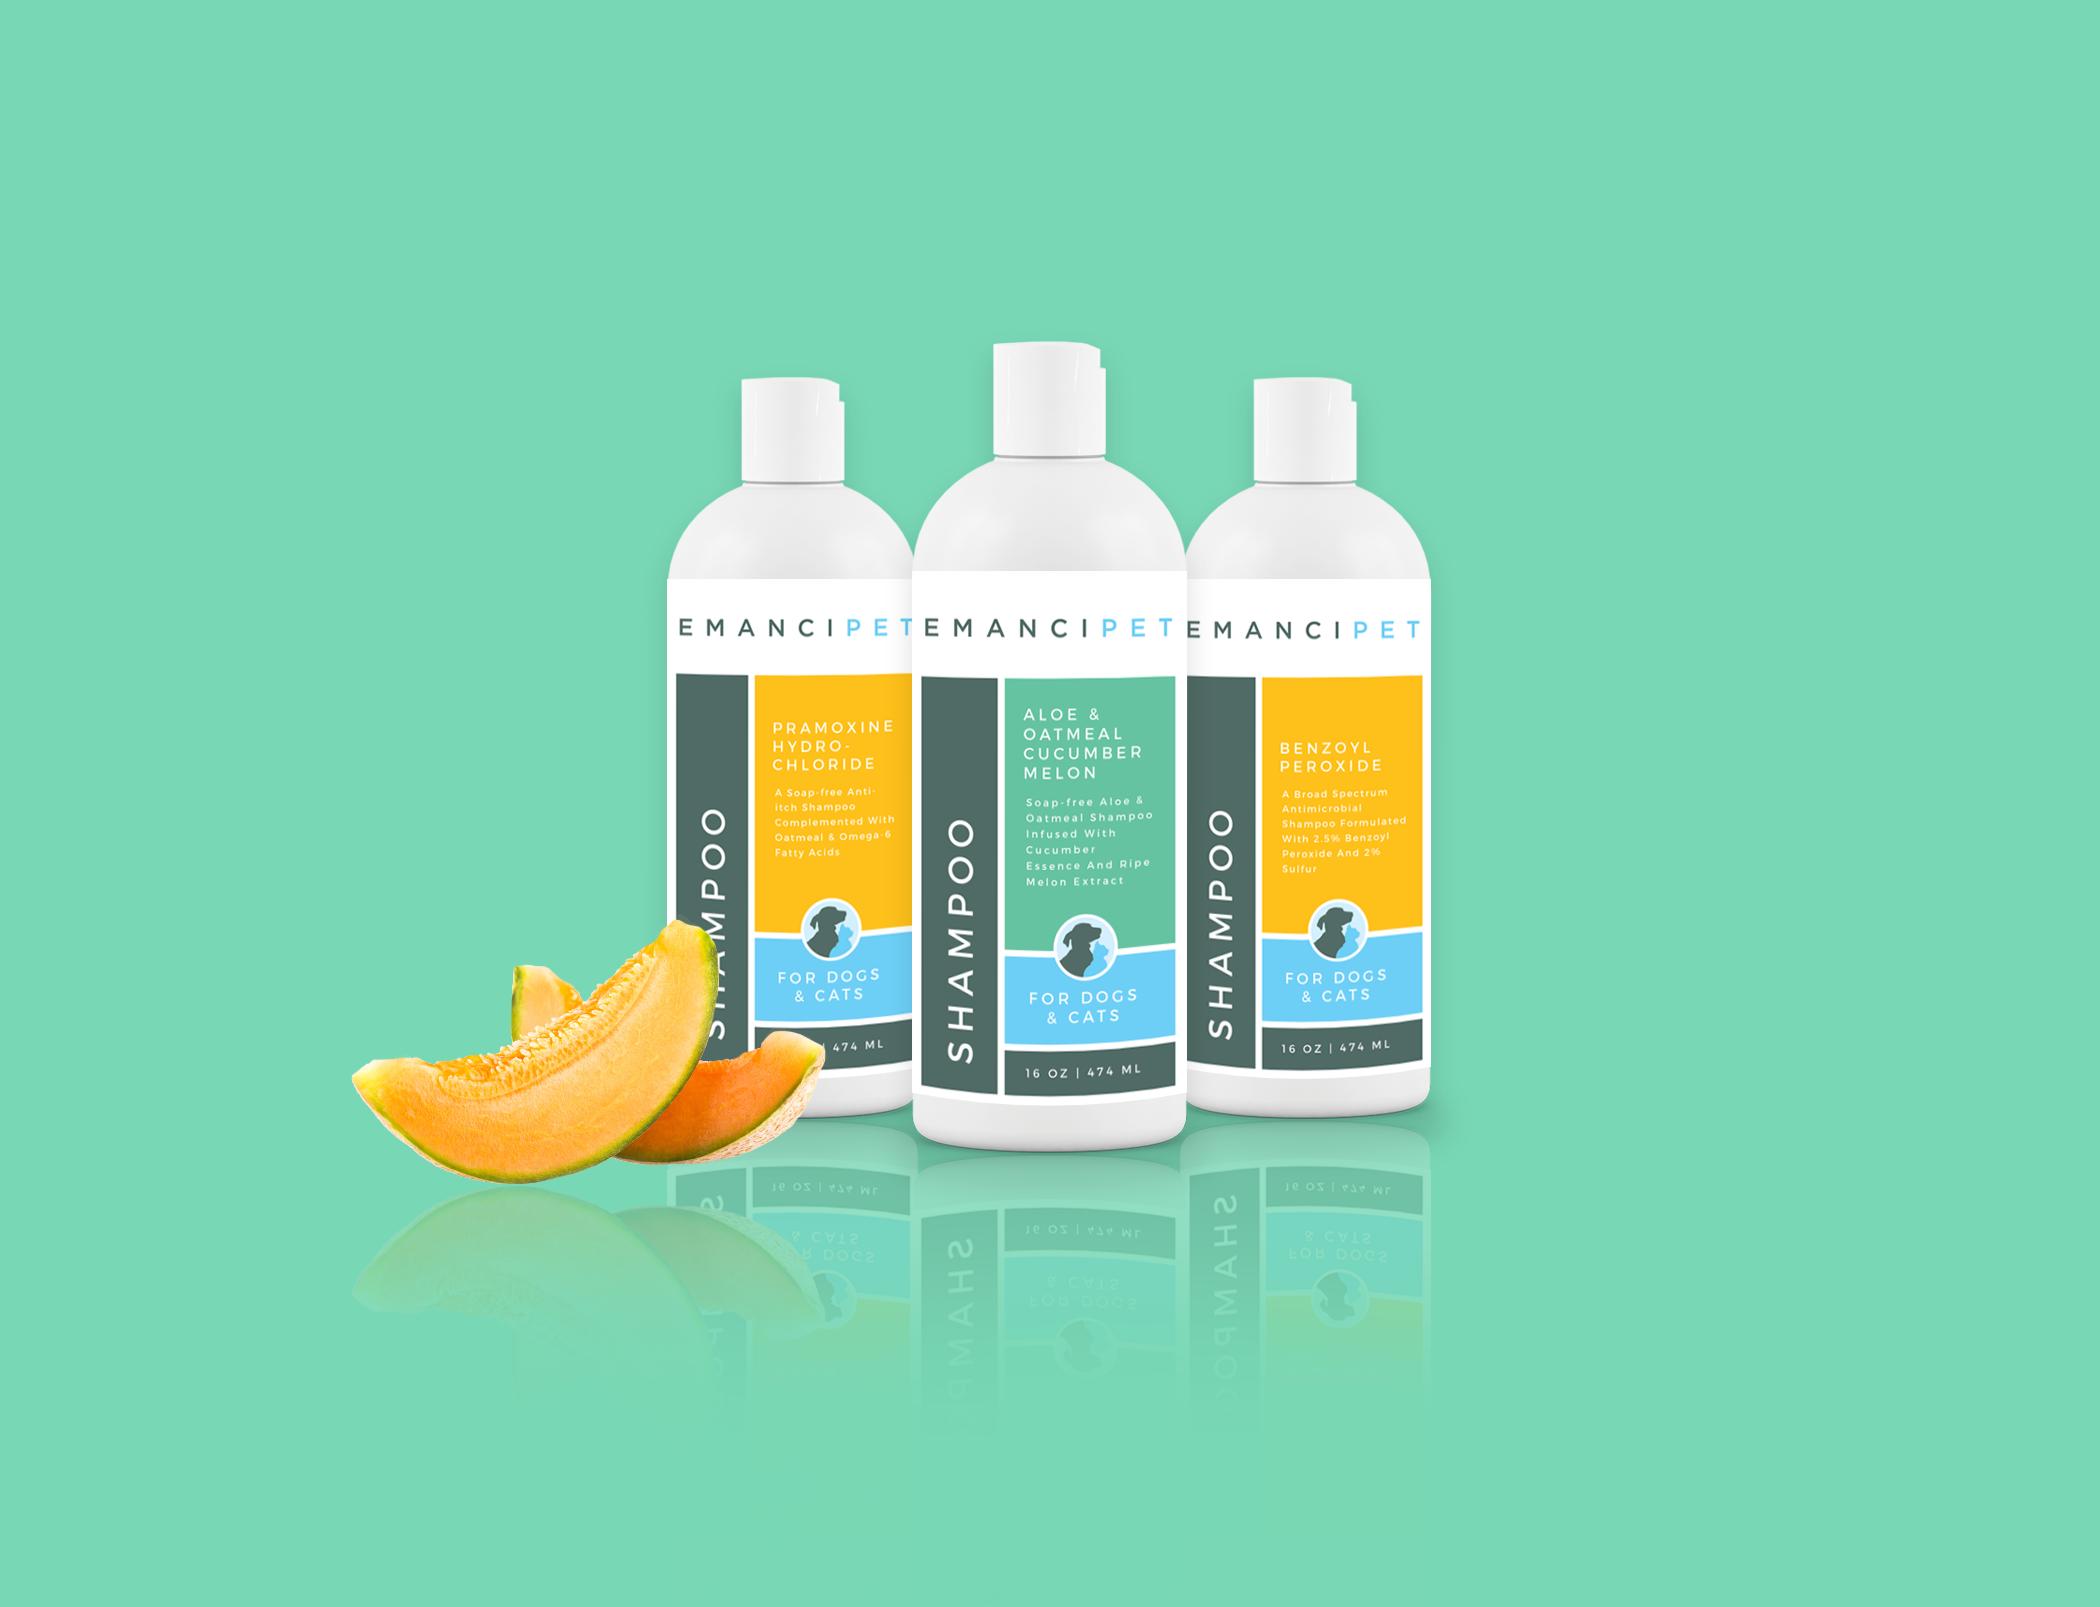 Emancipet Product Label